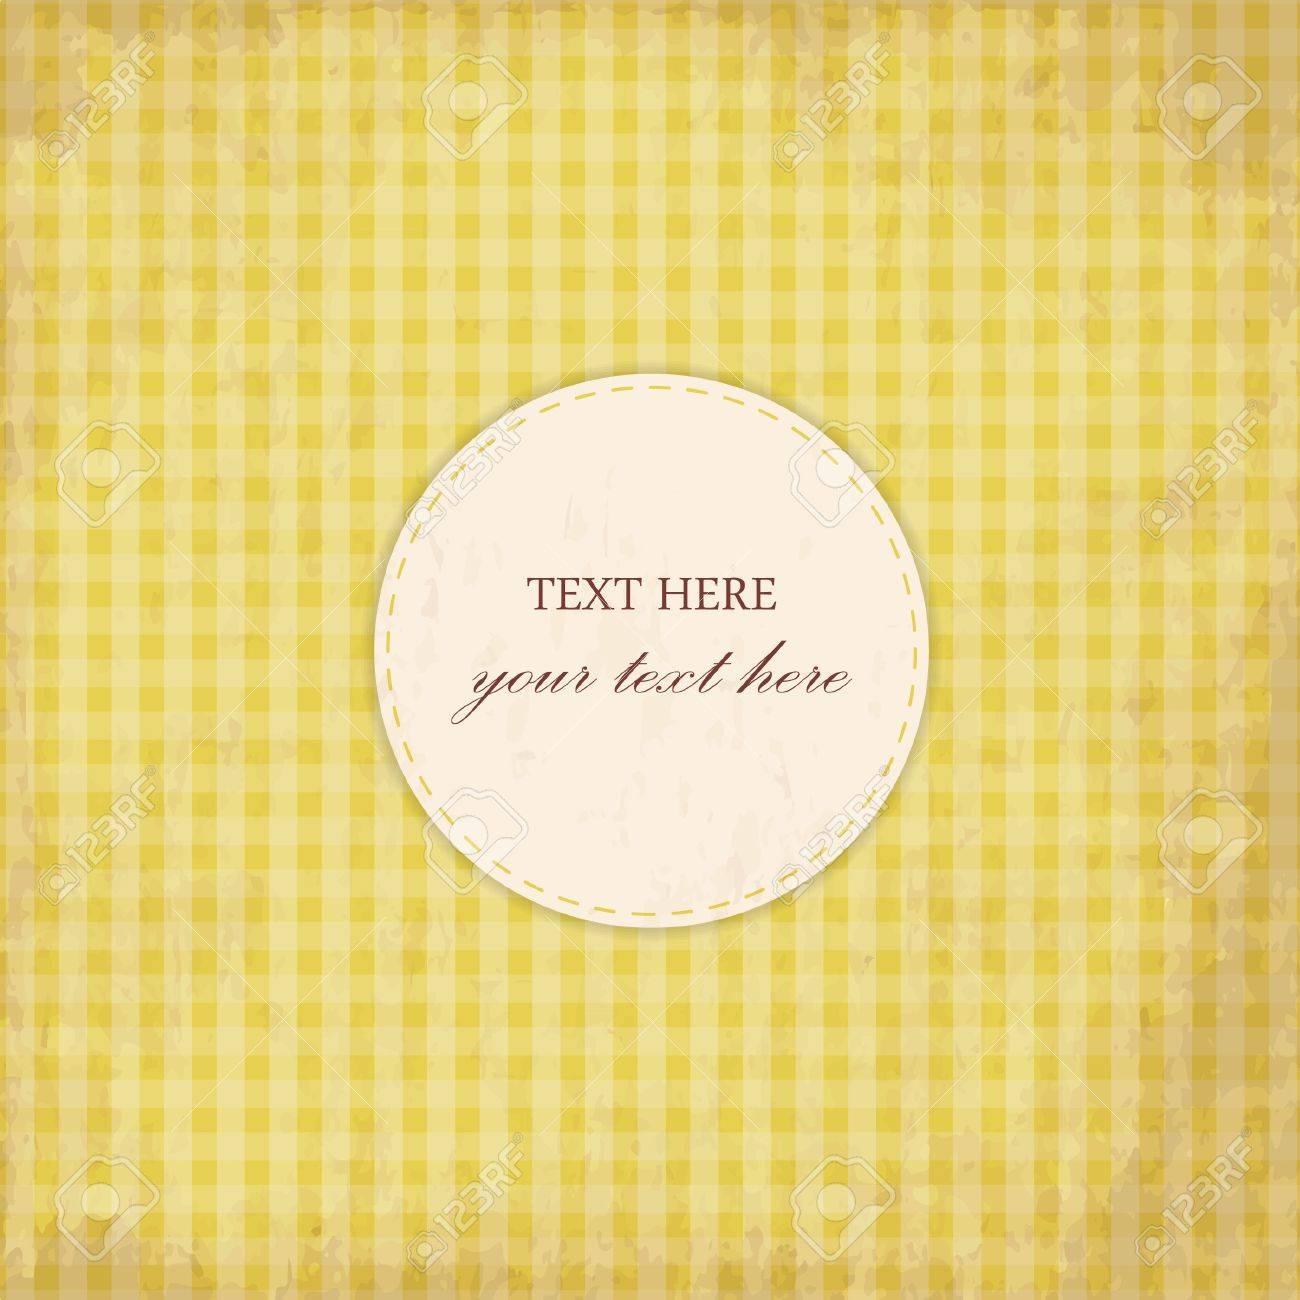 Grunge Yellow Vintage Card, Plaid Design Stock Vector - 16329508